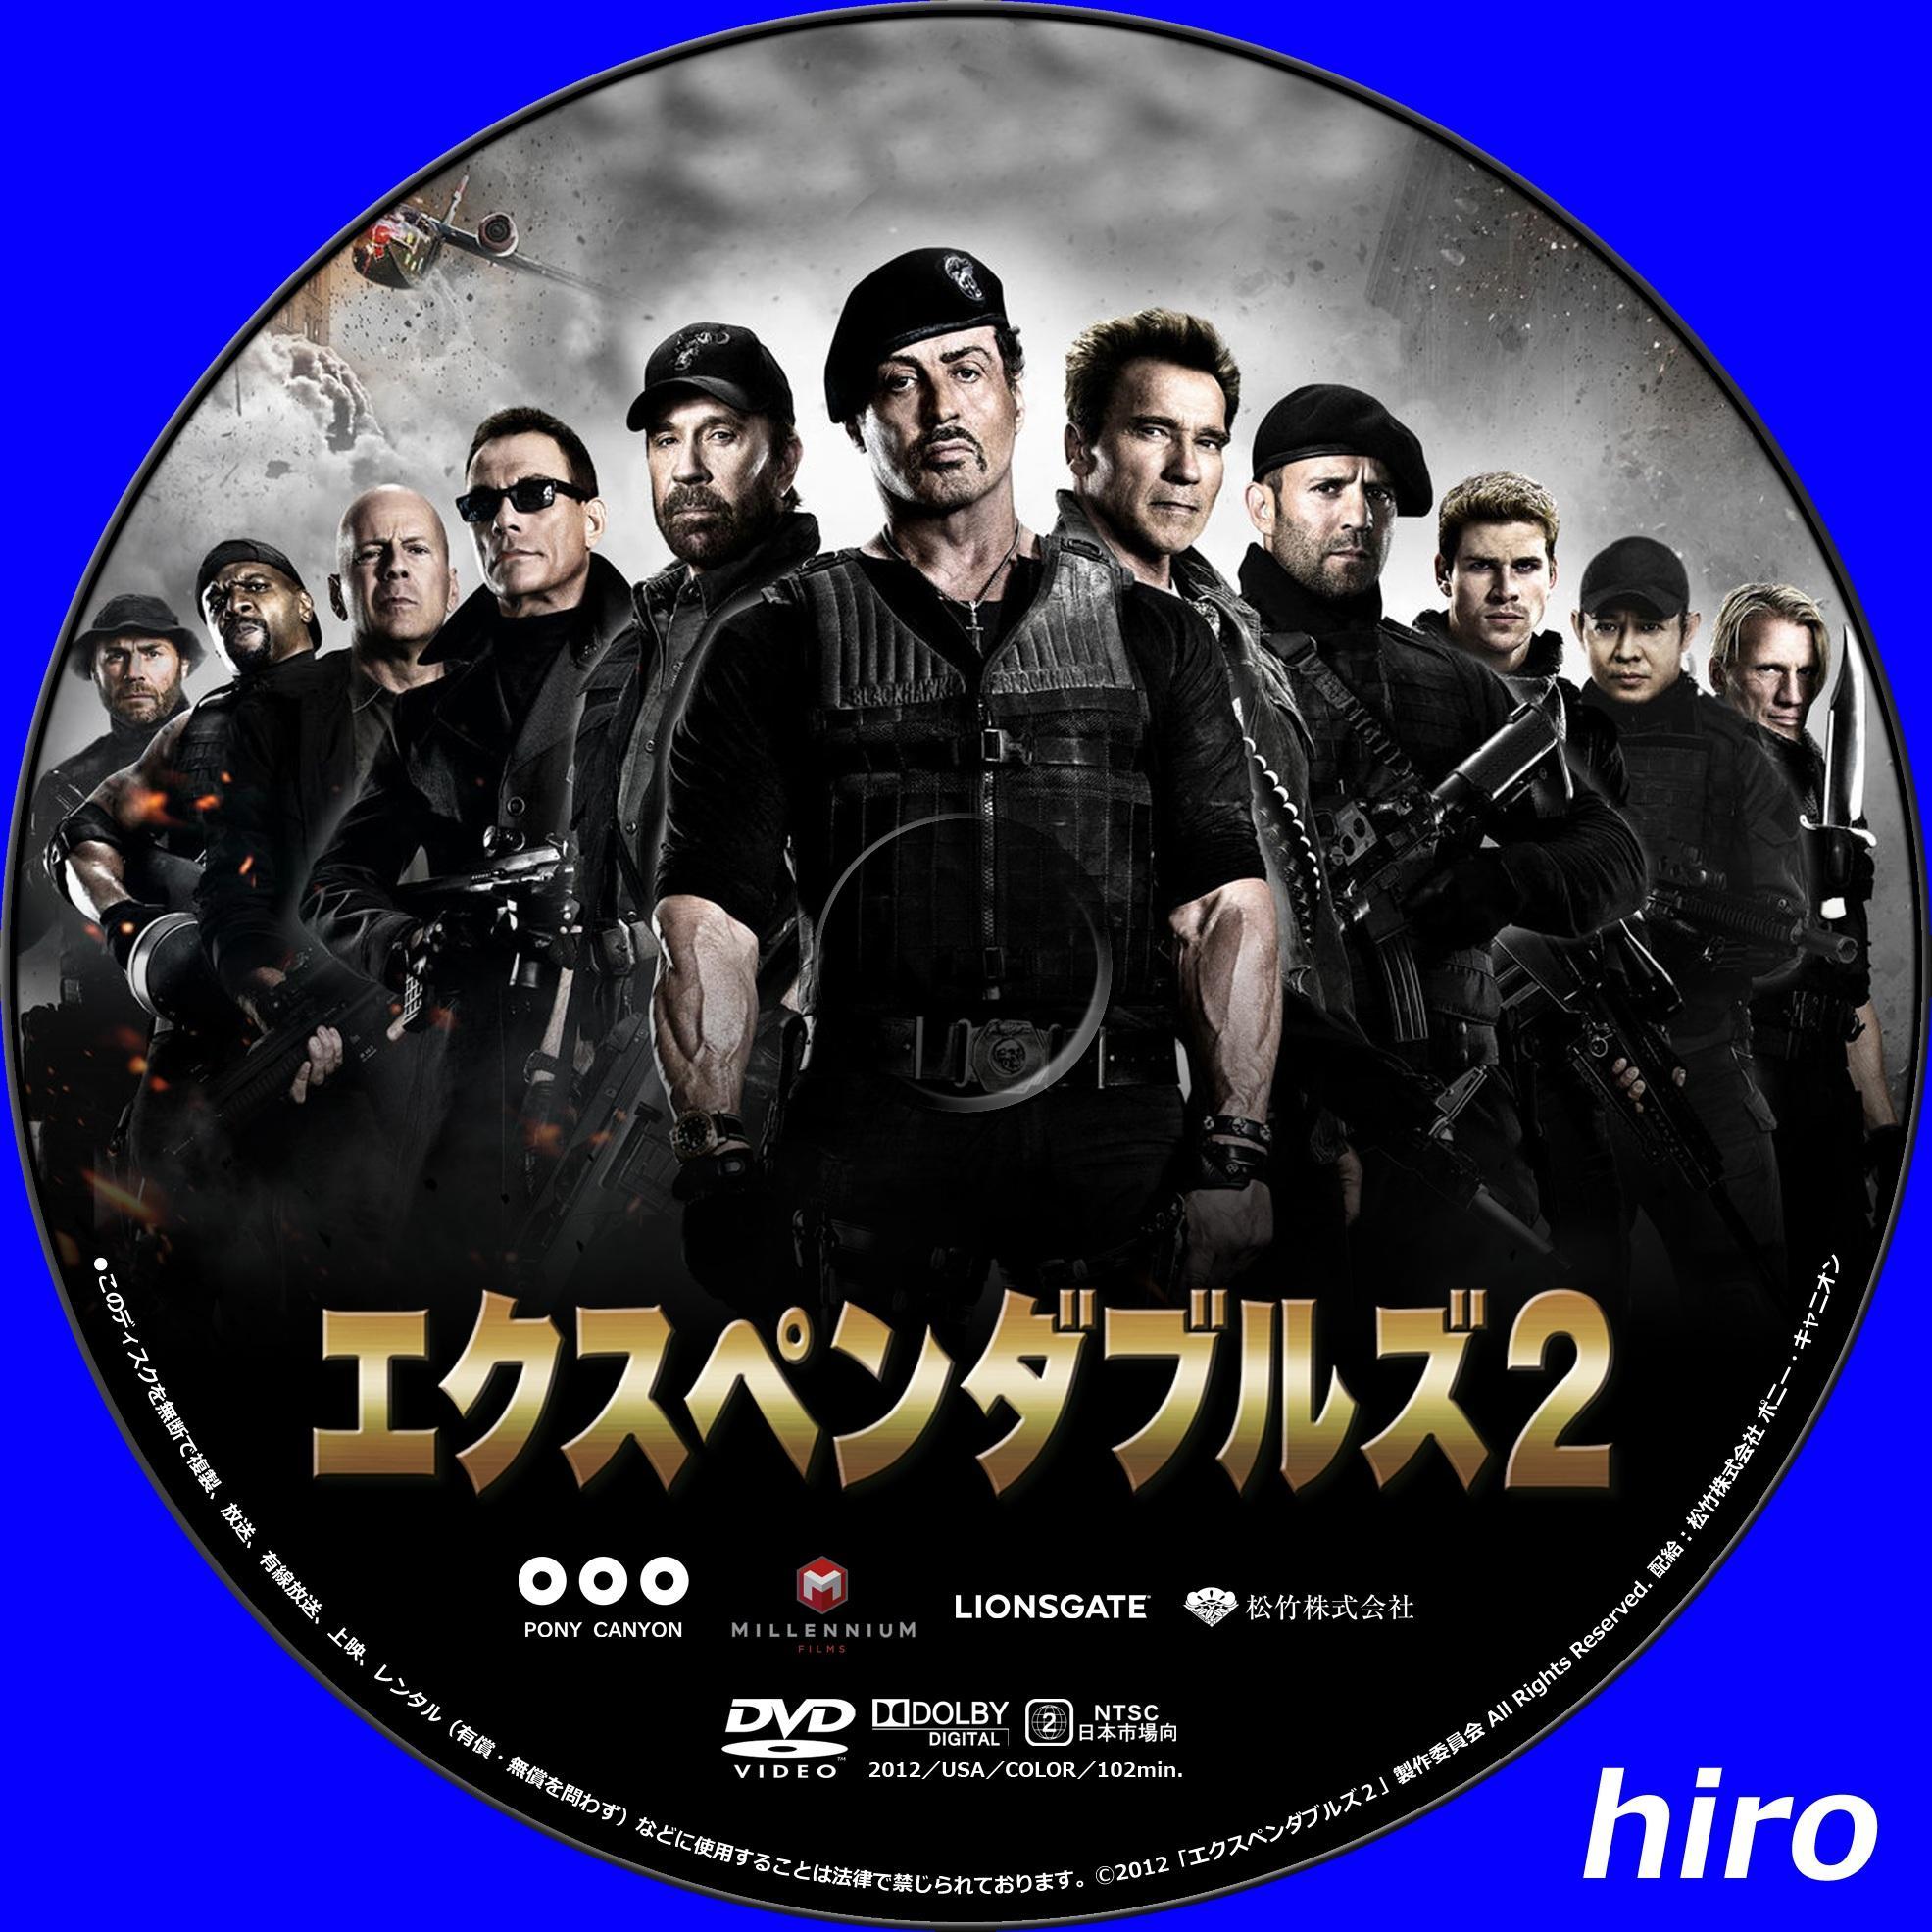 Image search: Tarzan caratula DVD